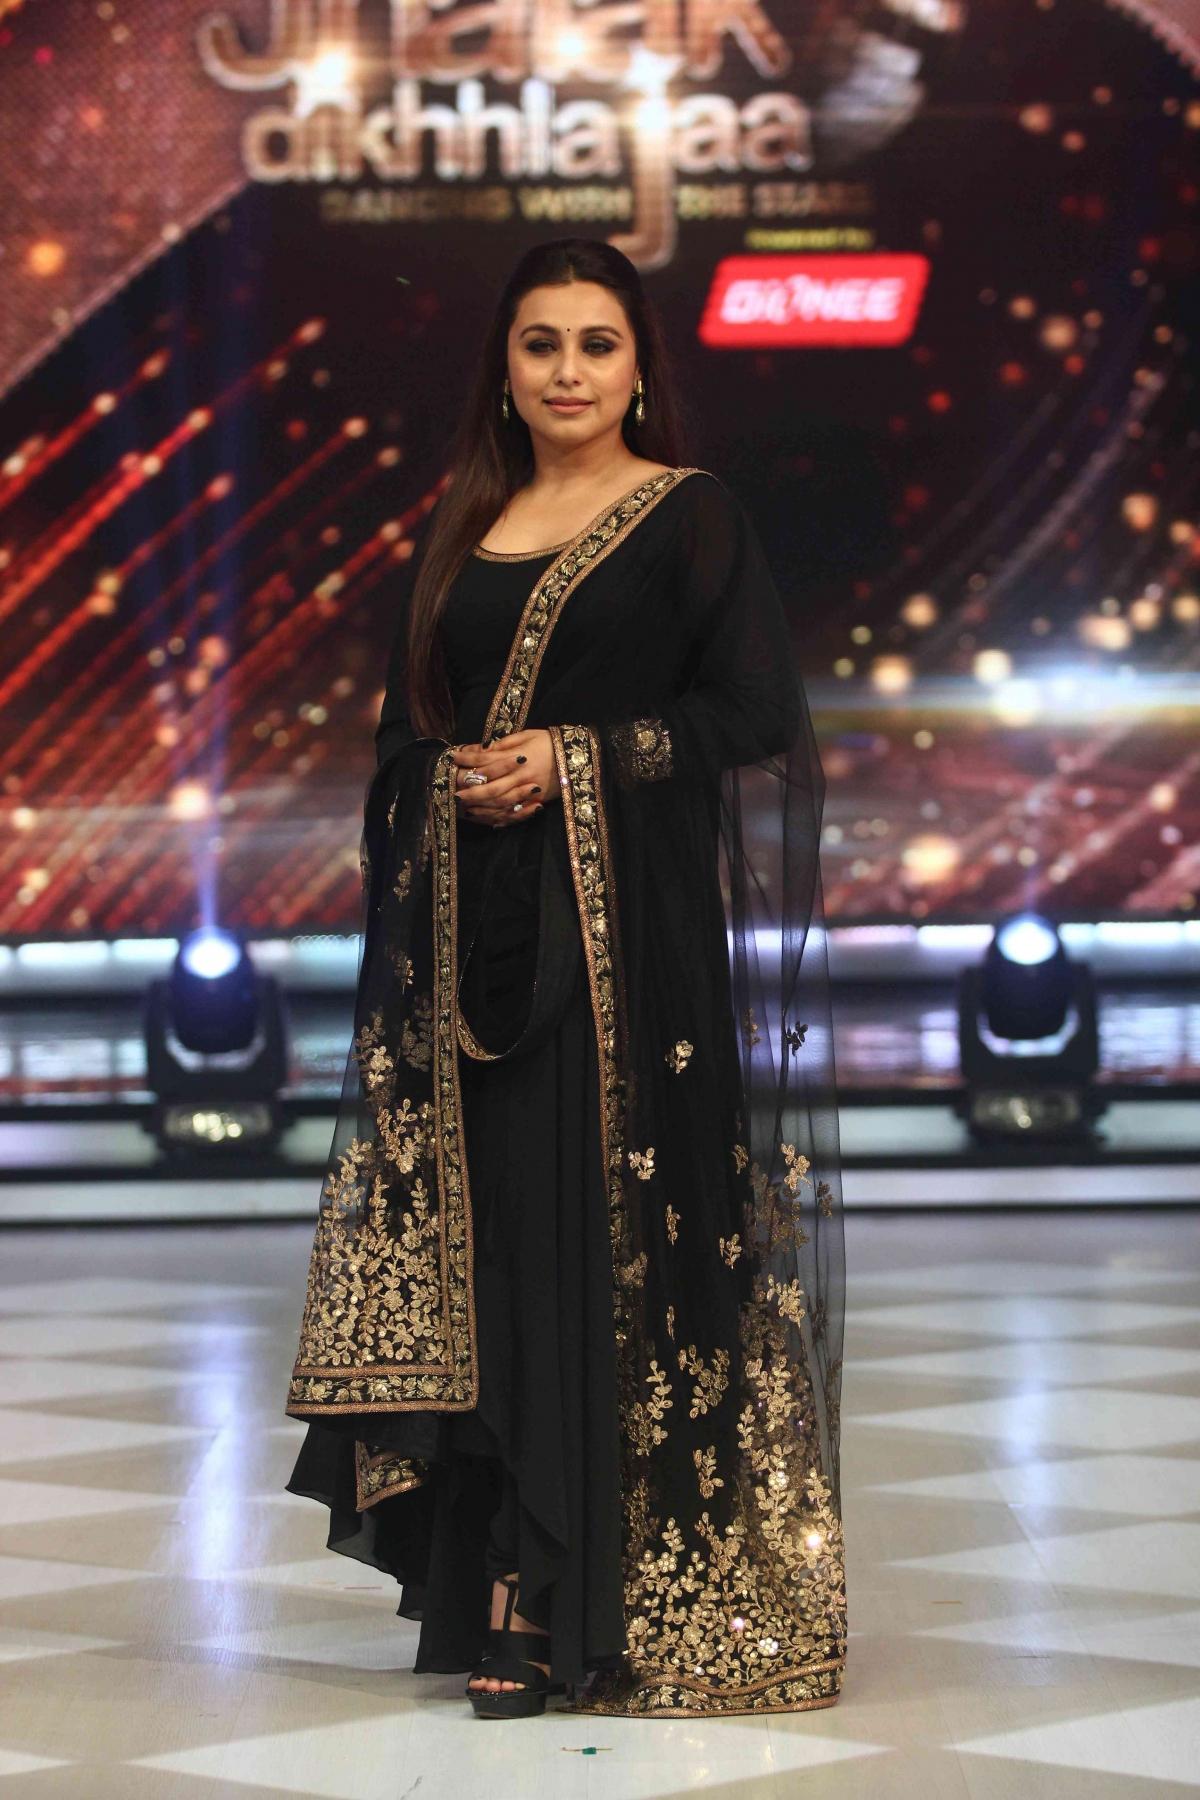 Rani Promotes Mardaani Jhalak Dikhhla Jaa